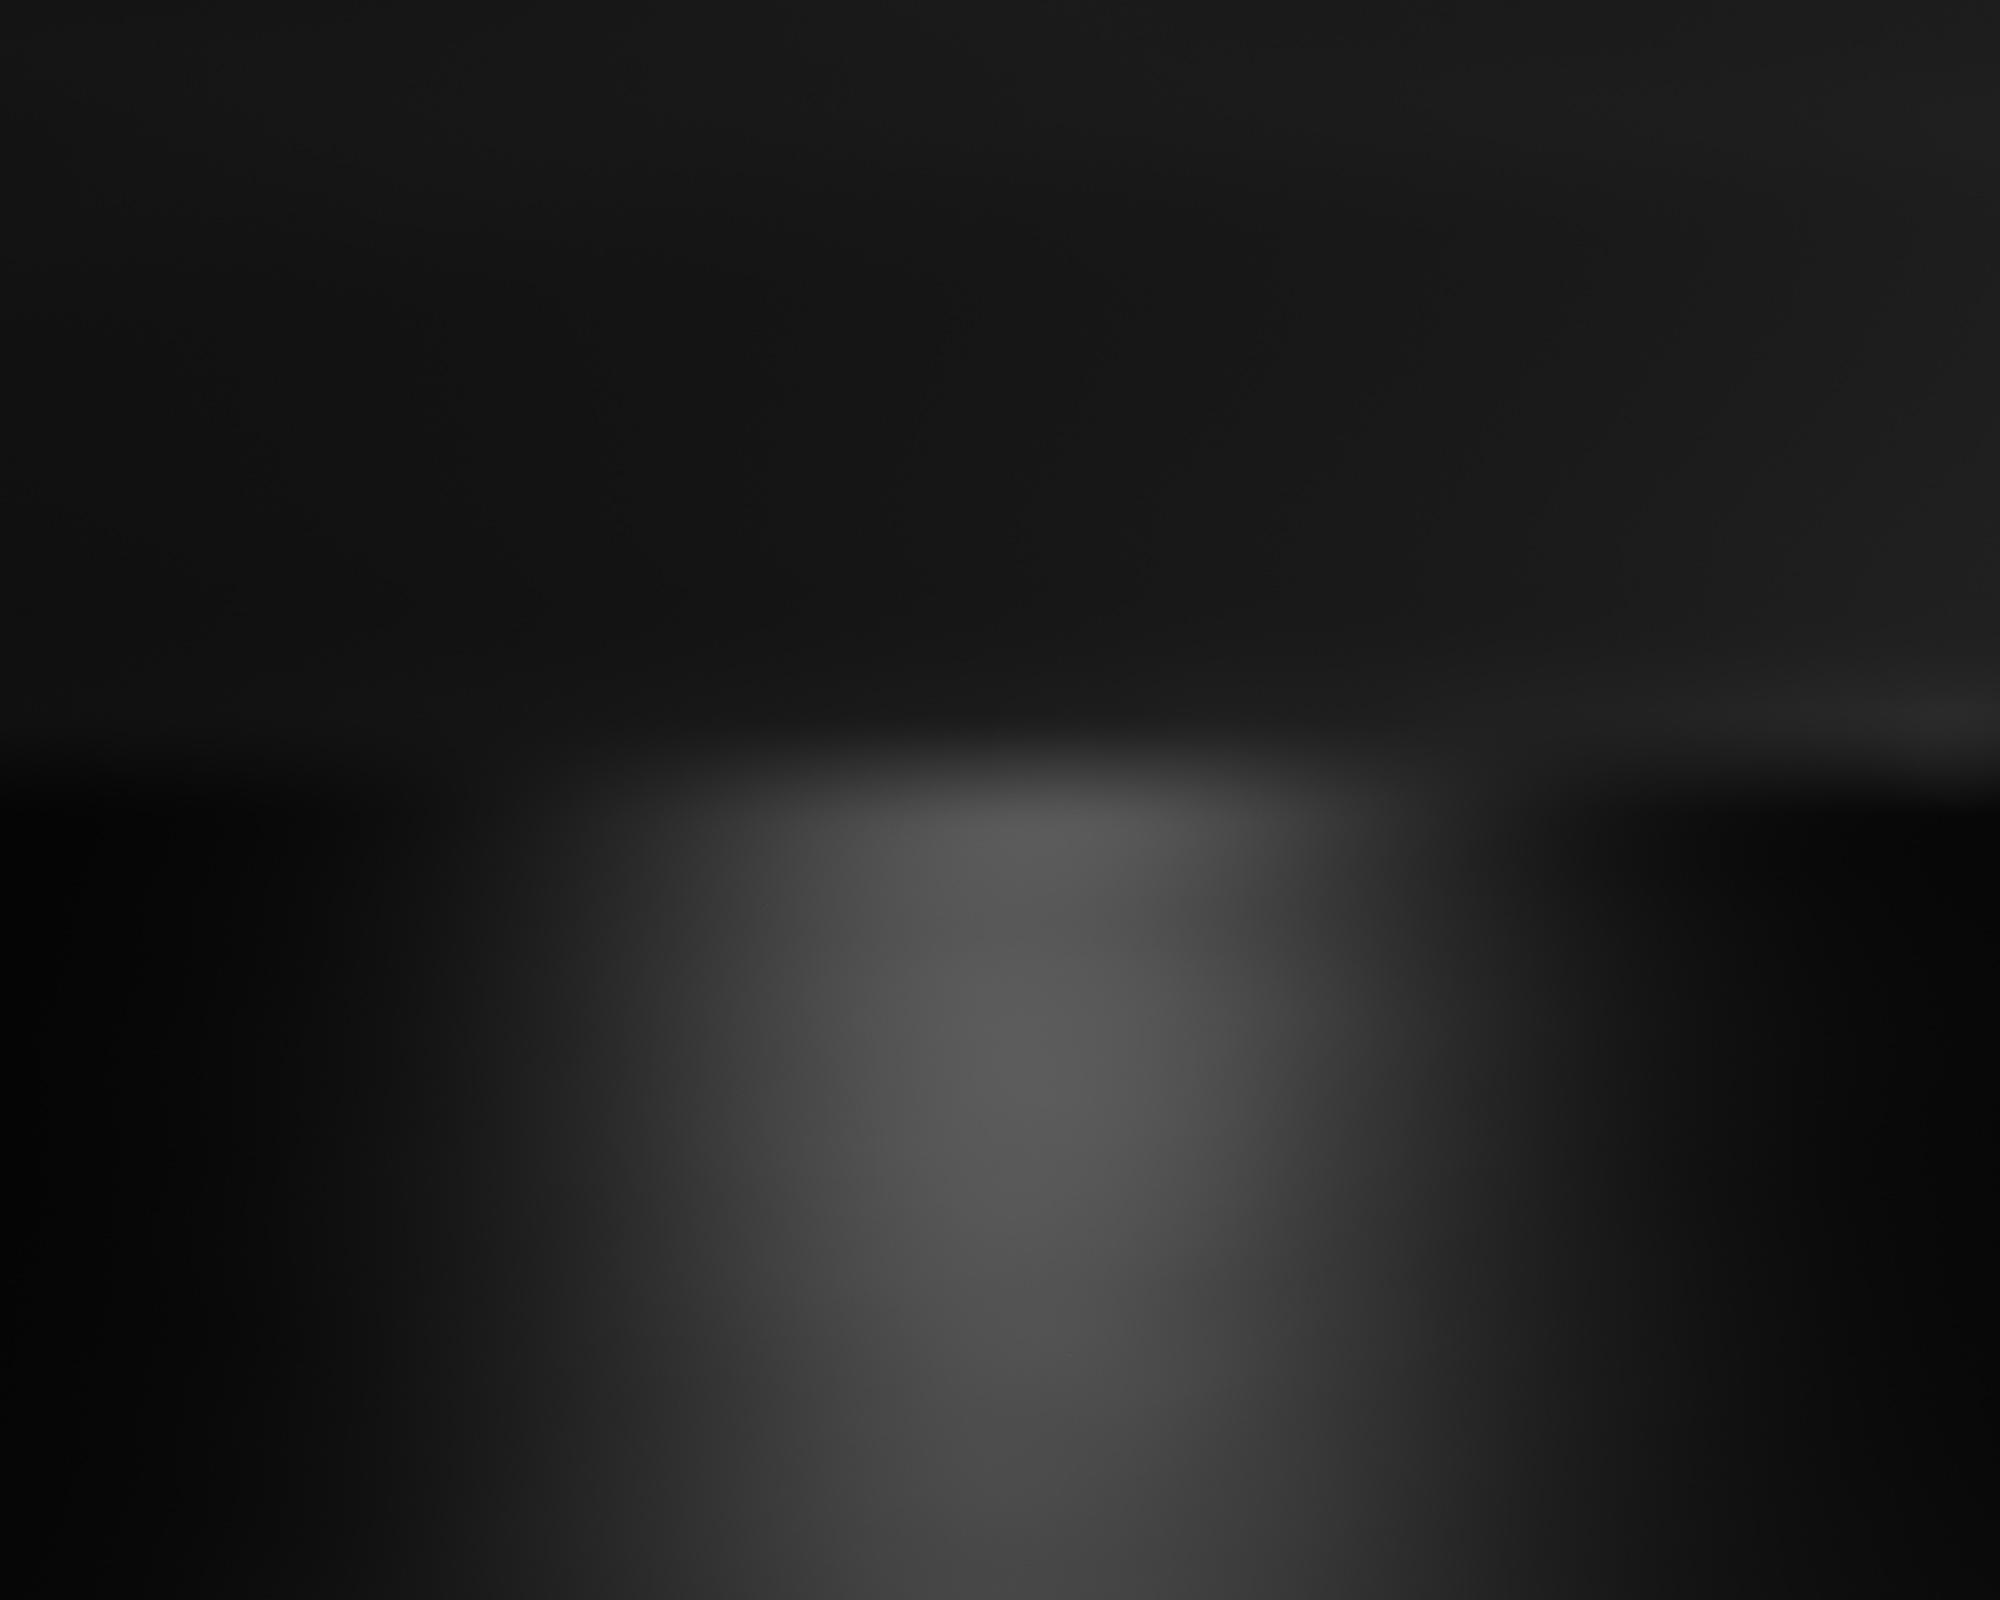 L1009874.jpg